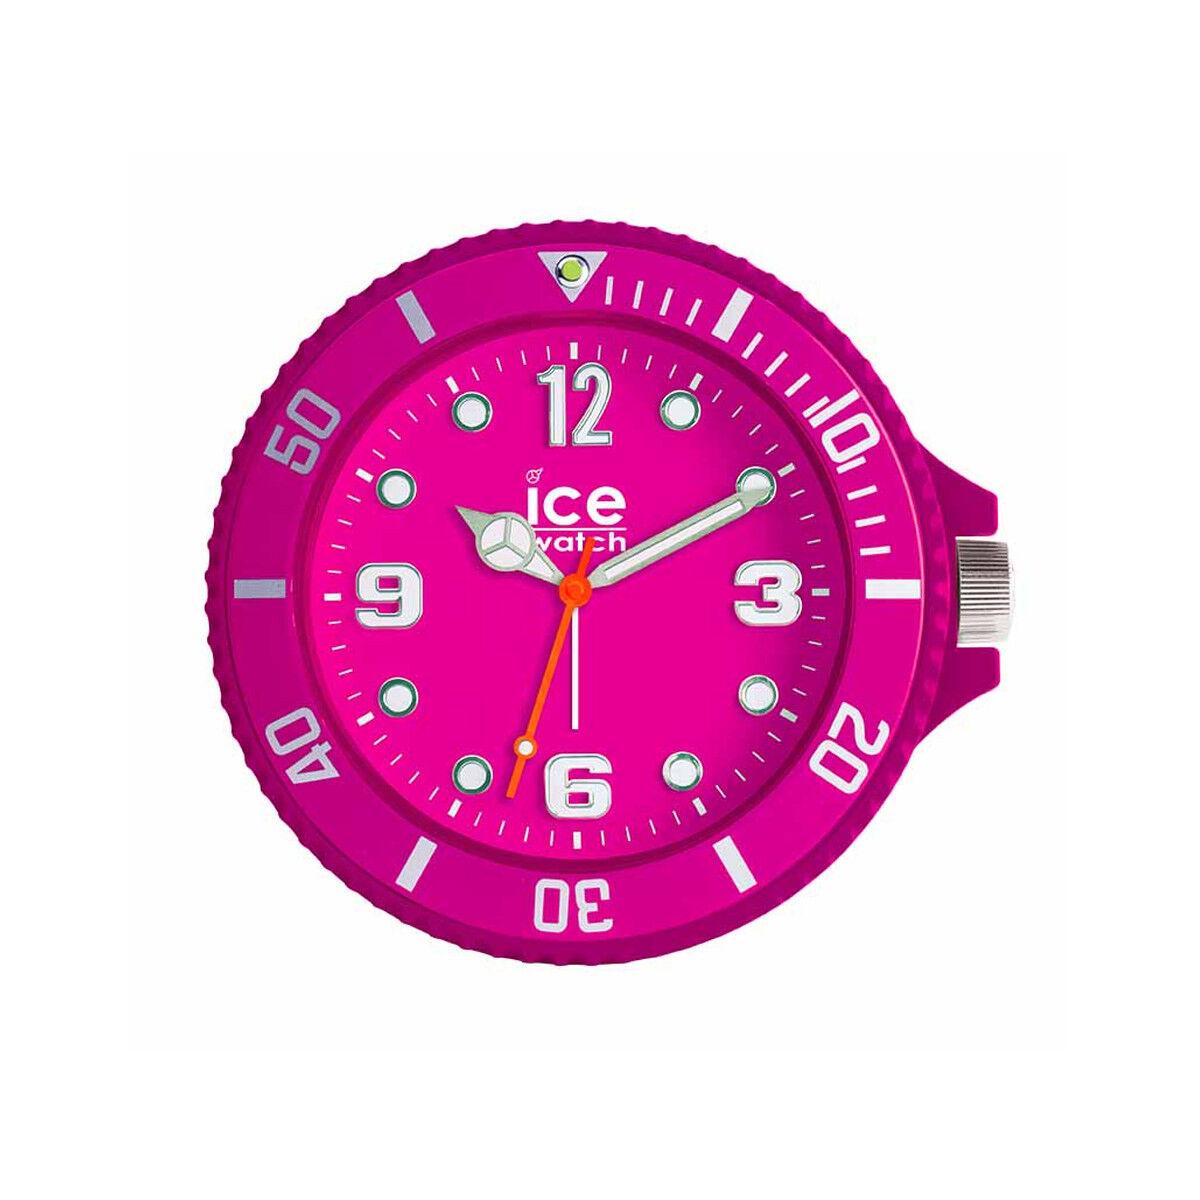 ICE WATCH Reveil Ice Watch plastique rose- MATY